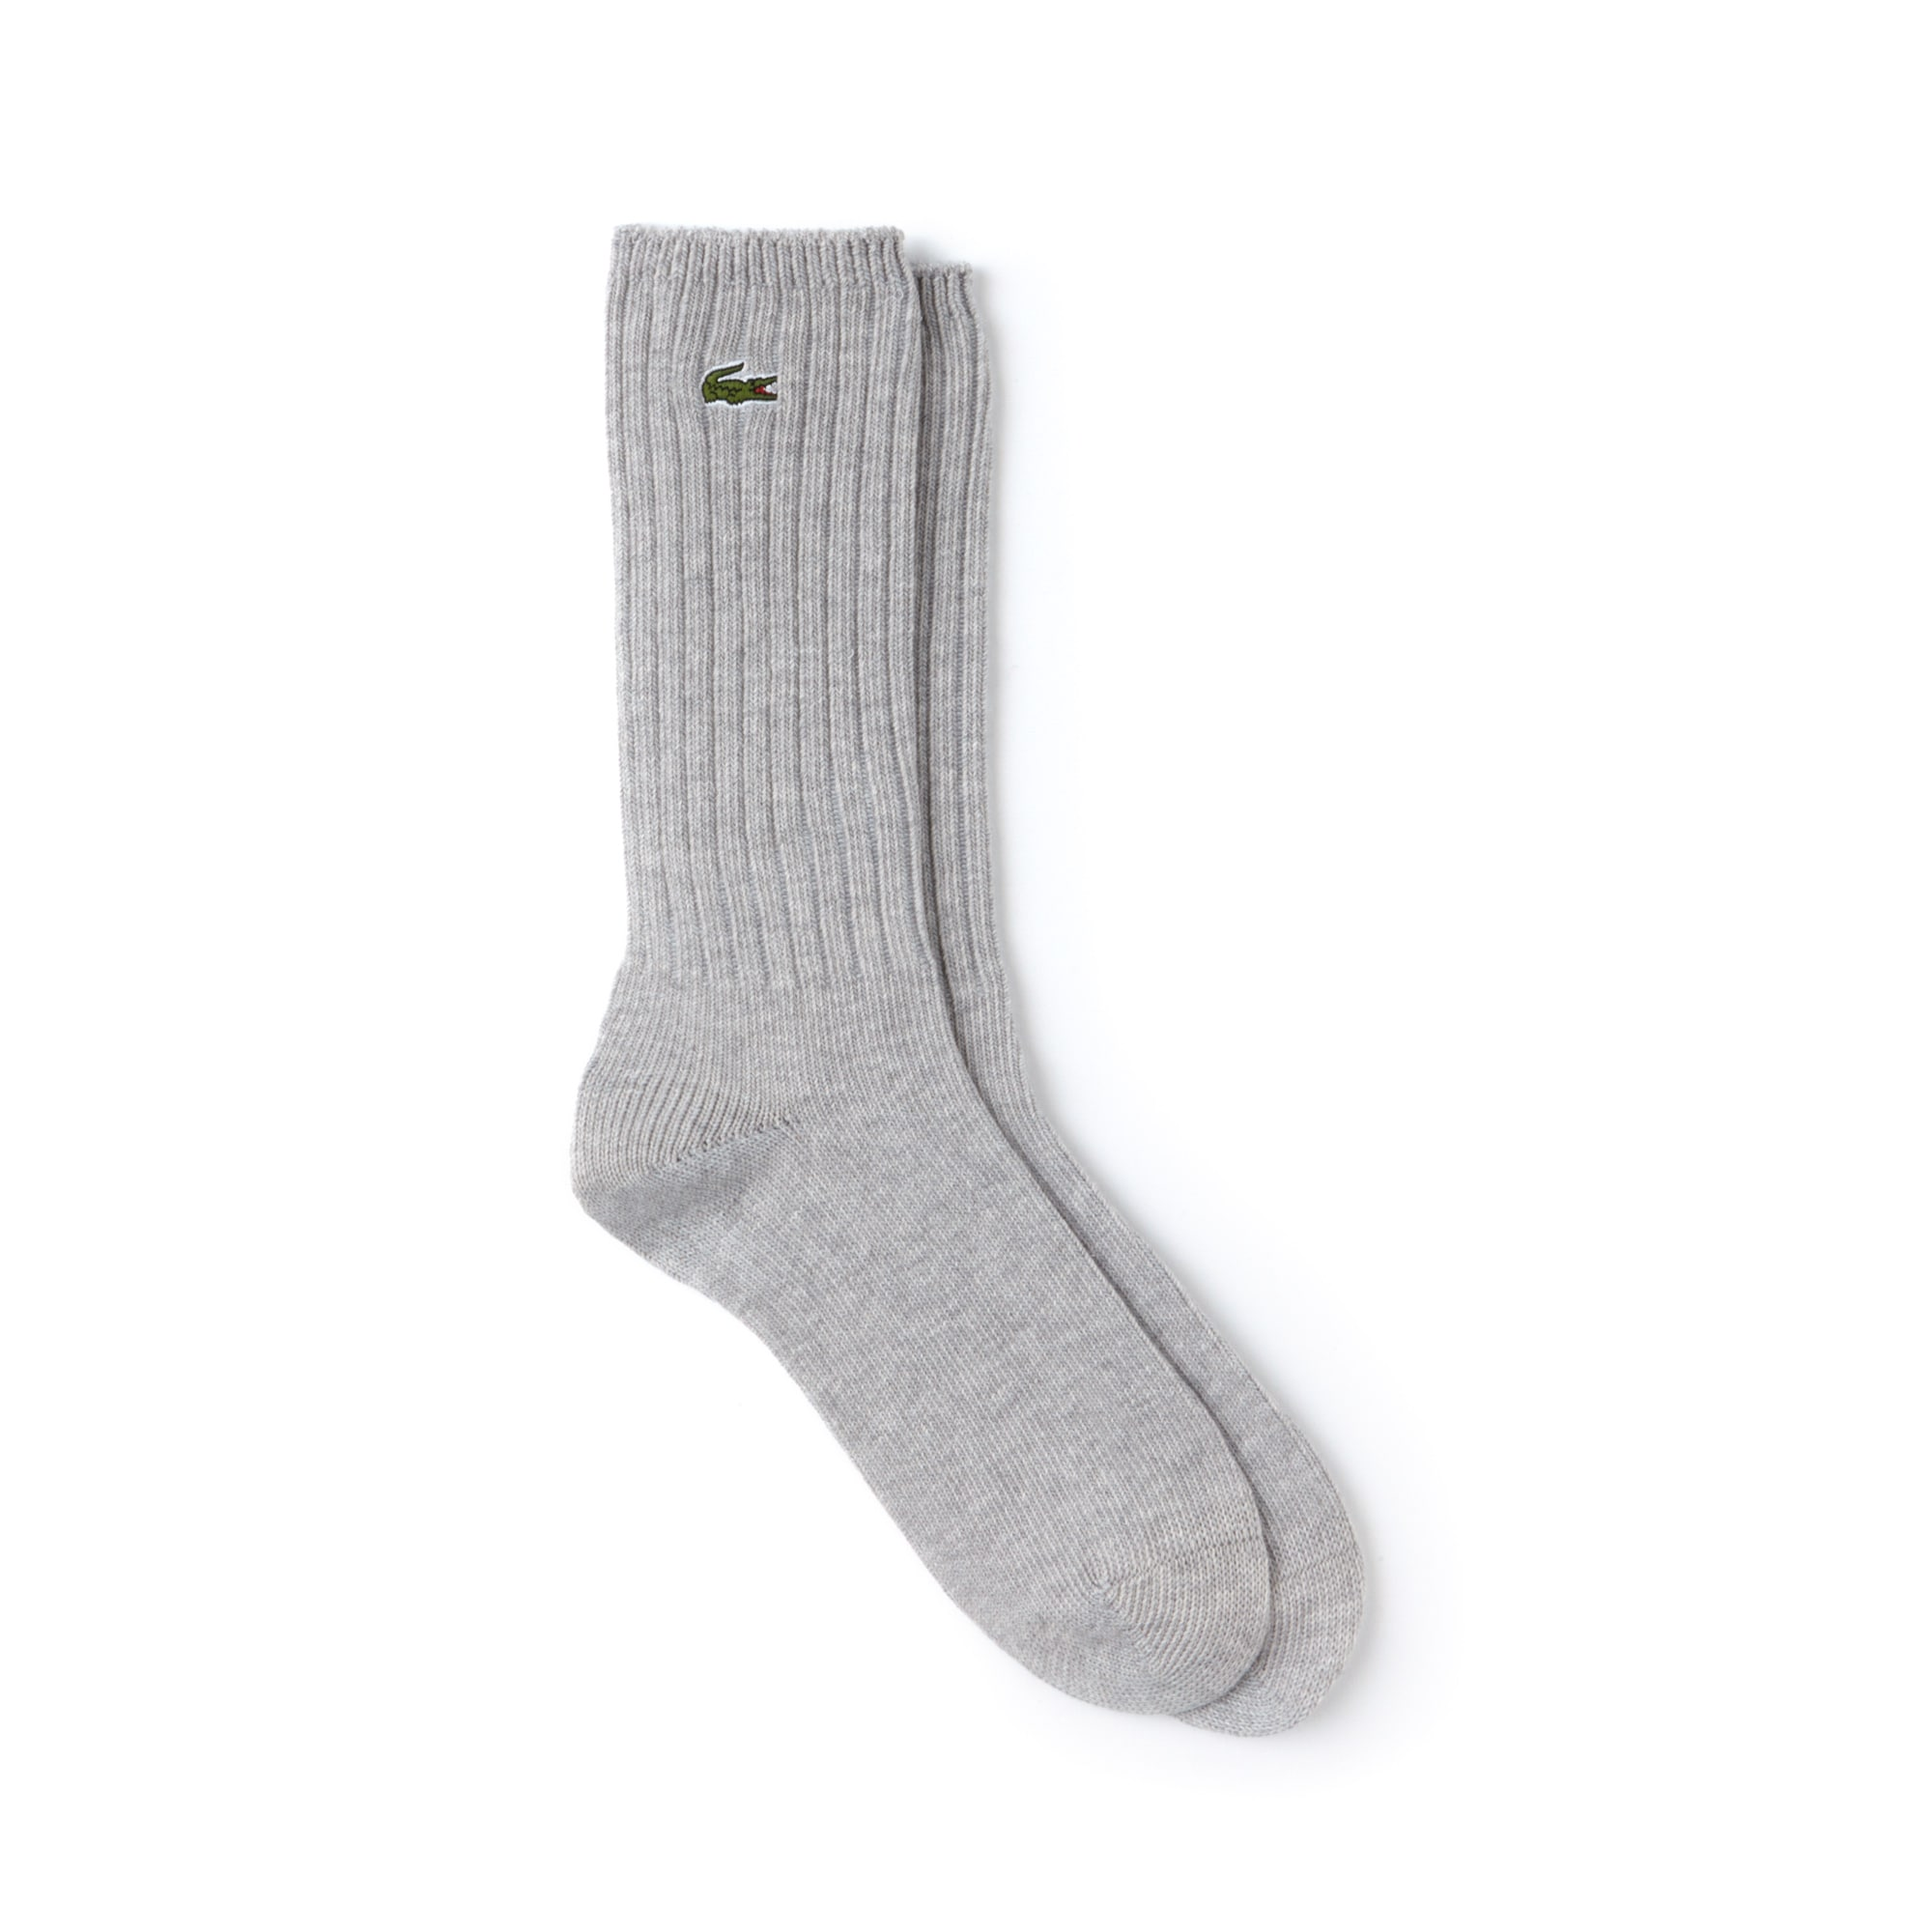 Men's Ribbed Stretch Cotton Socks